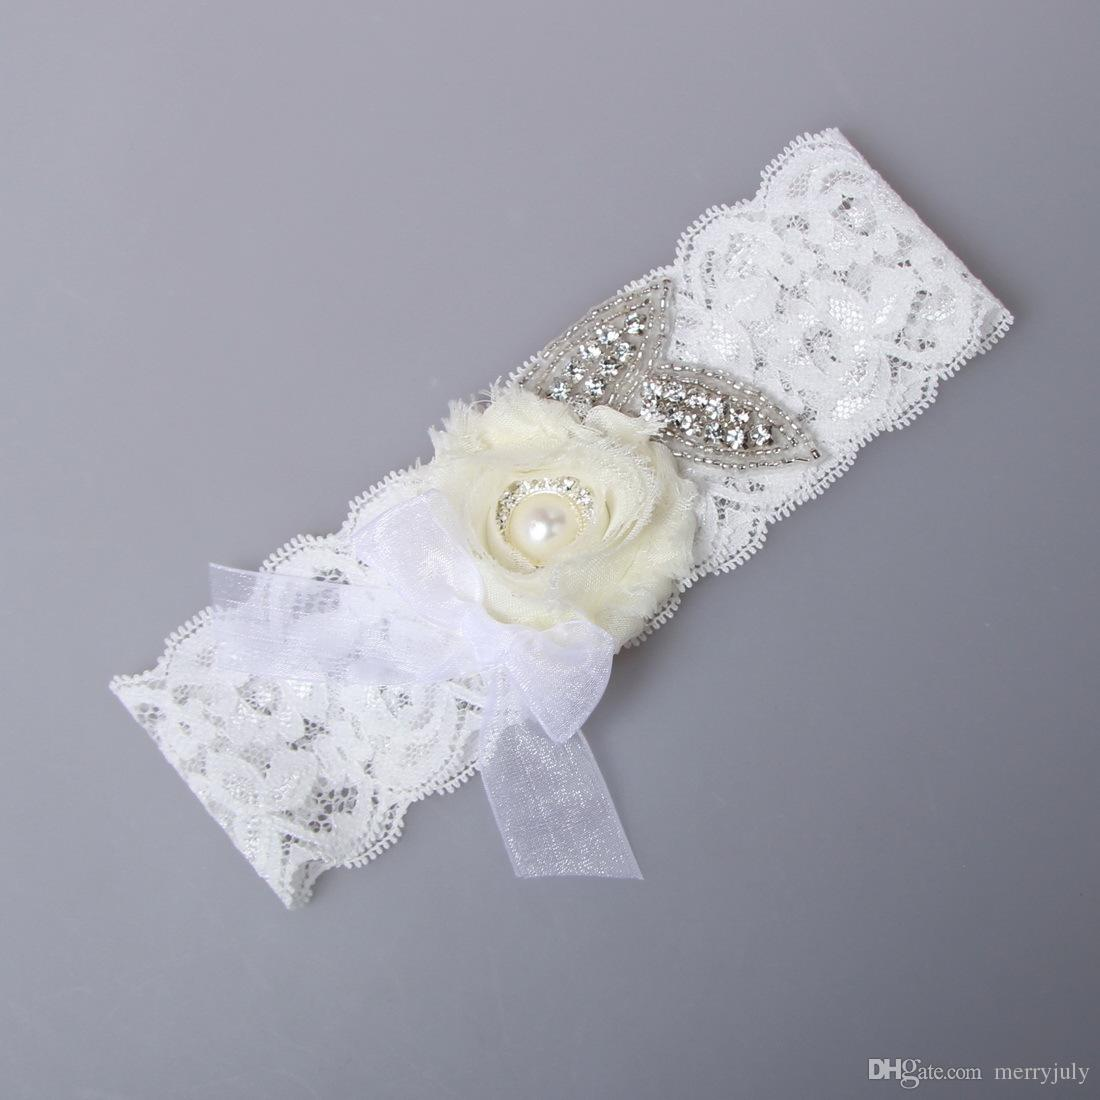 Wedding Bridal Garter Lace with Iovry Flower Bridal Wedding Garter Set Belt Ivory Cheap Prom Leg Garter 2017 In Stock